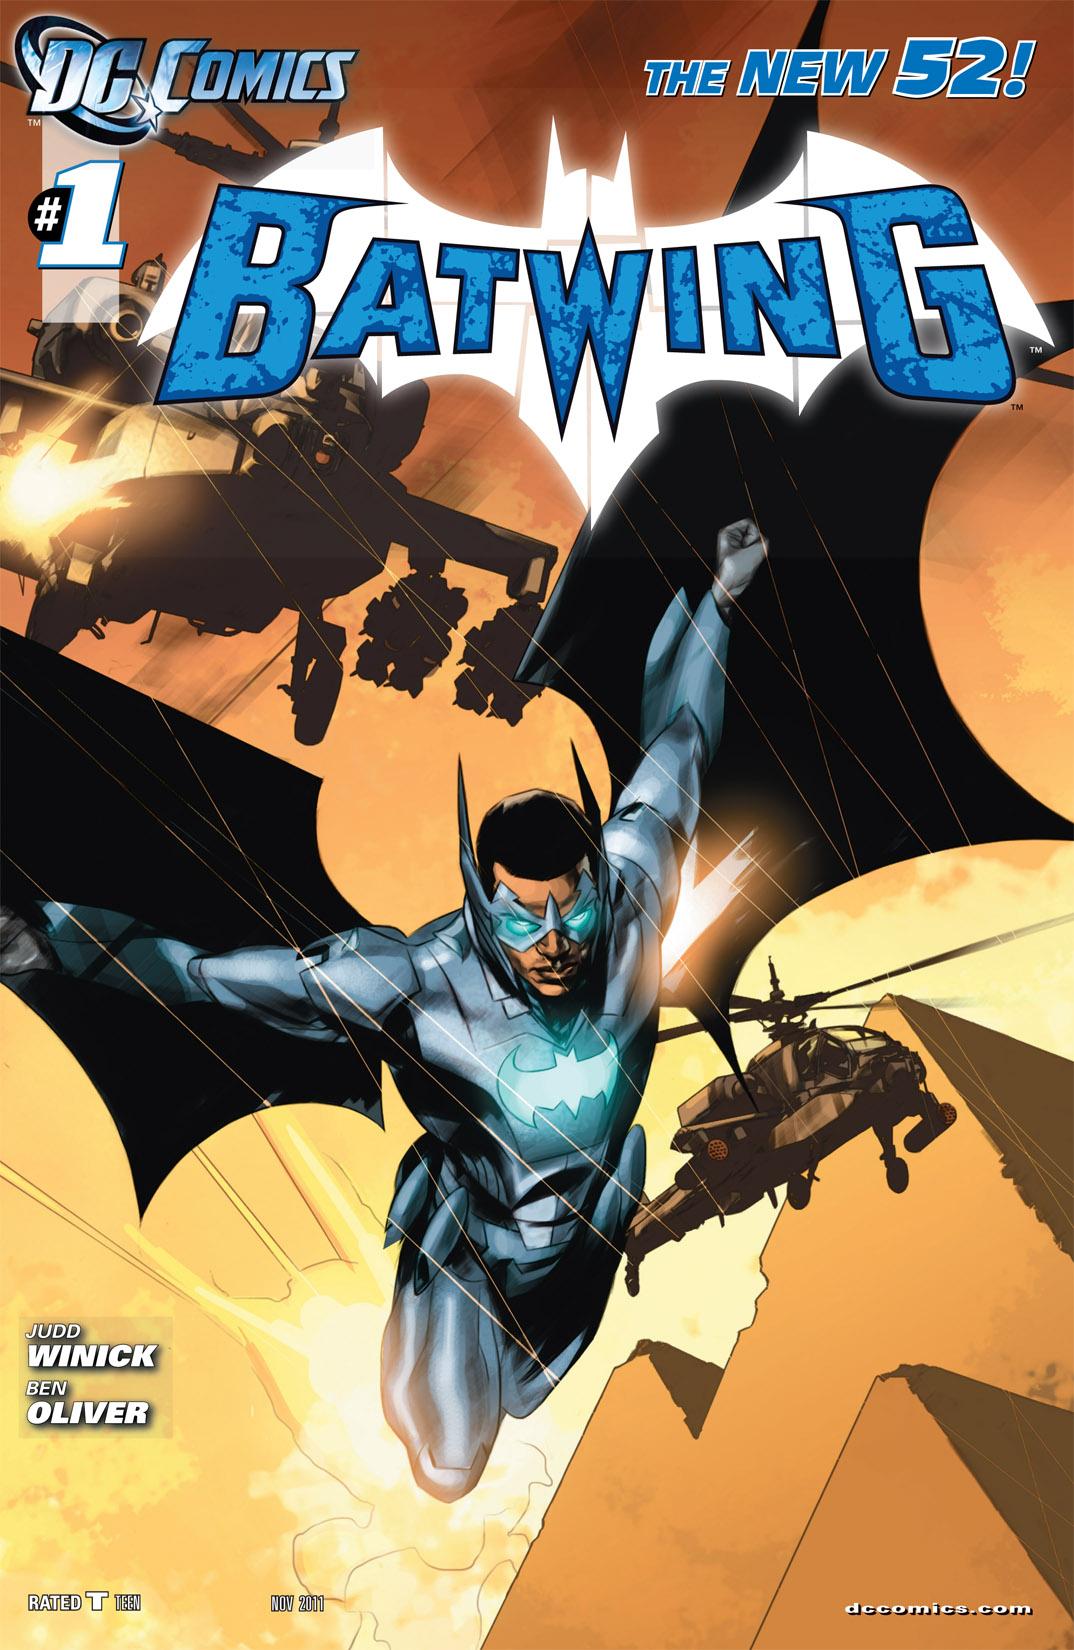 Couverture Batwing #1